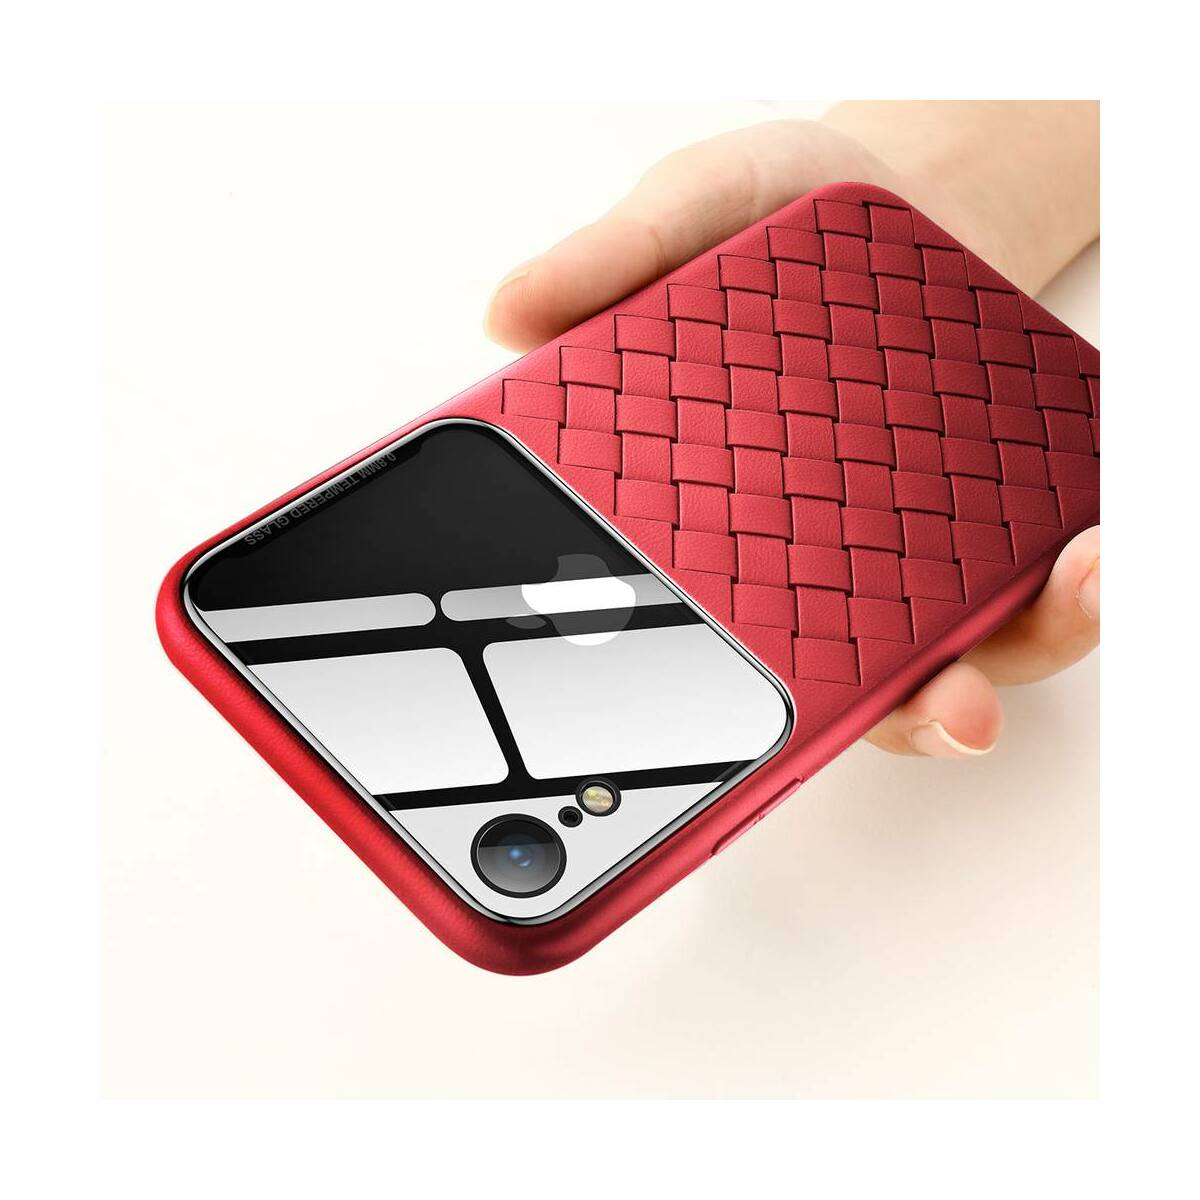 Baseus iPhone XR üveg & tok, BV Weaving, piros (WIAPIPH61-BL09)